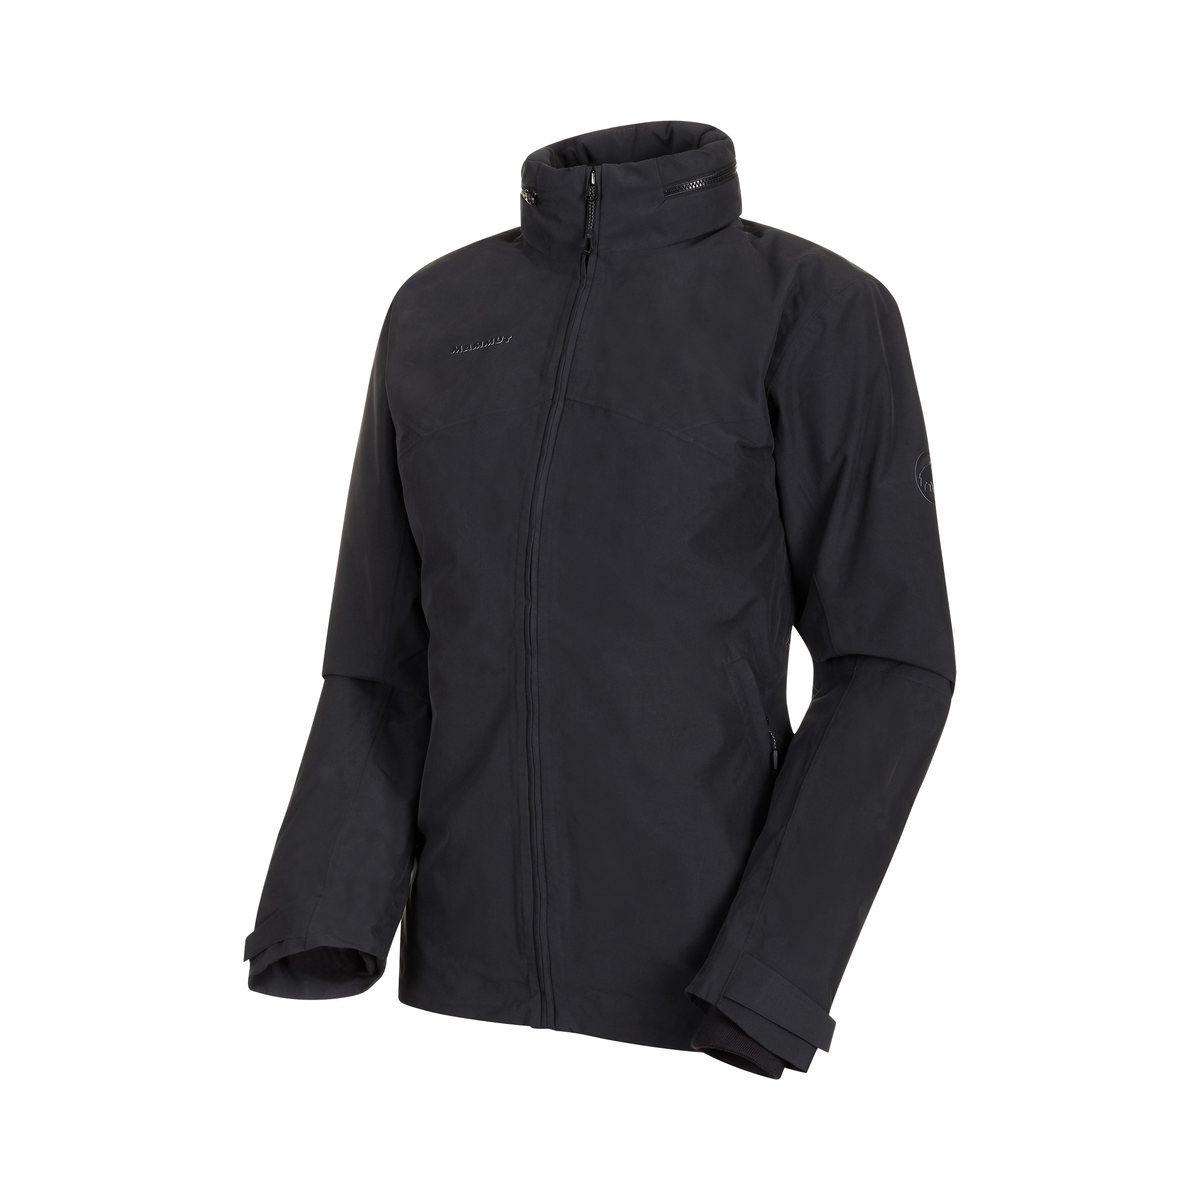 Mammut Damen 3in1 Trovat Hooded Hardshell-Jacke mit Kapuze